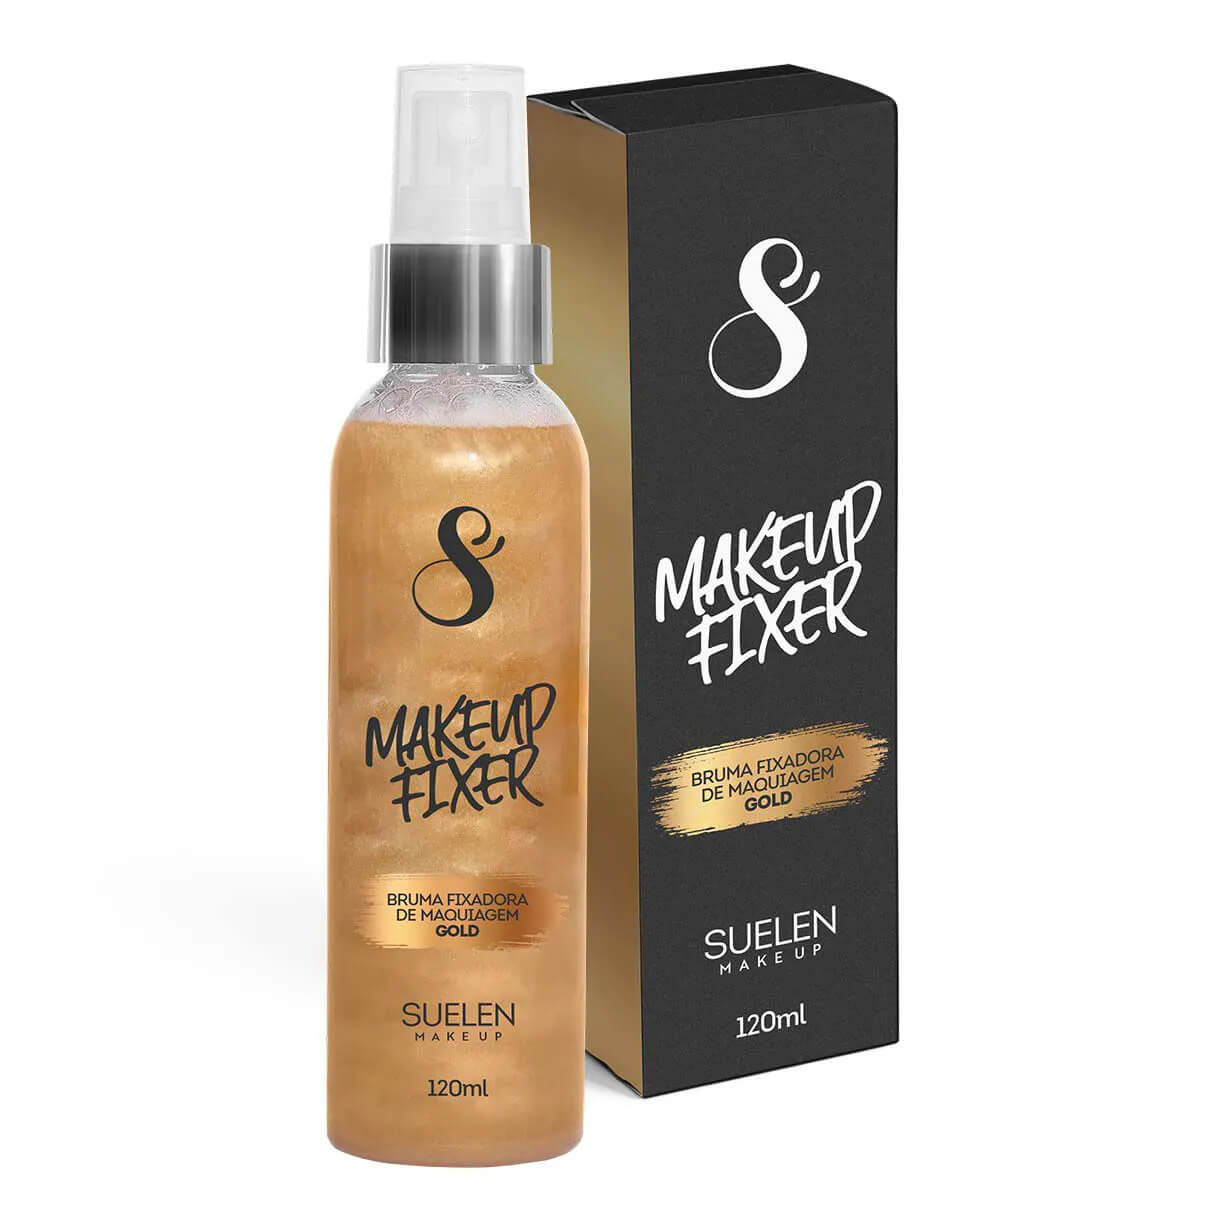 Bruma Fixadora de Maquiagem Gold Suelen Makeup